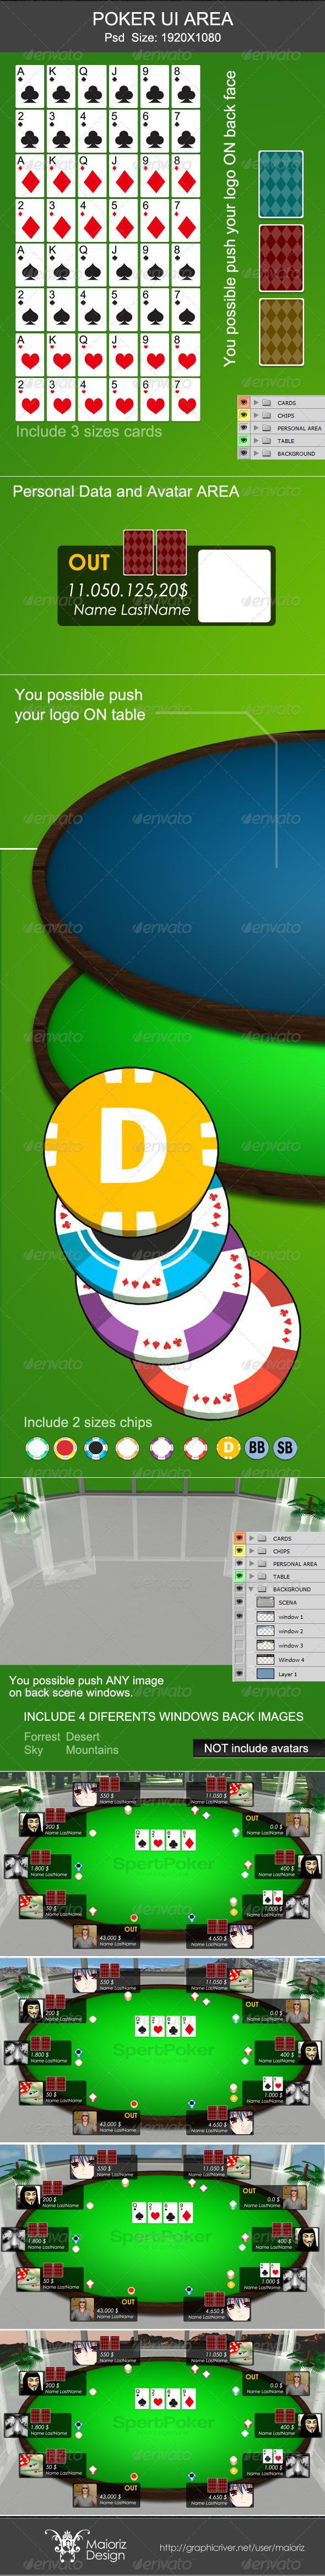 GraphicRiver Poker Ui Area 4441375